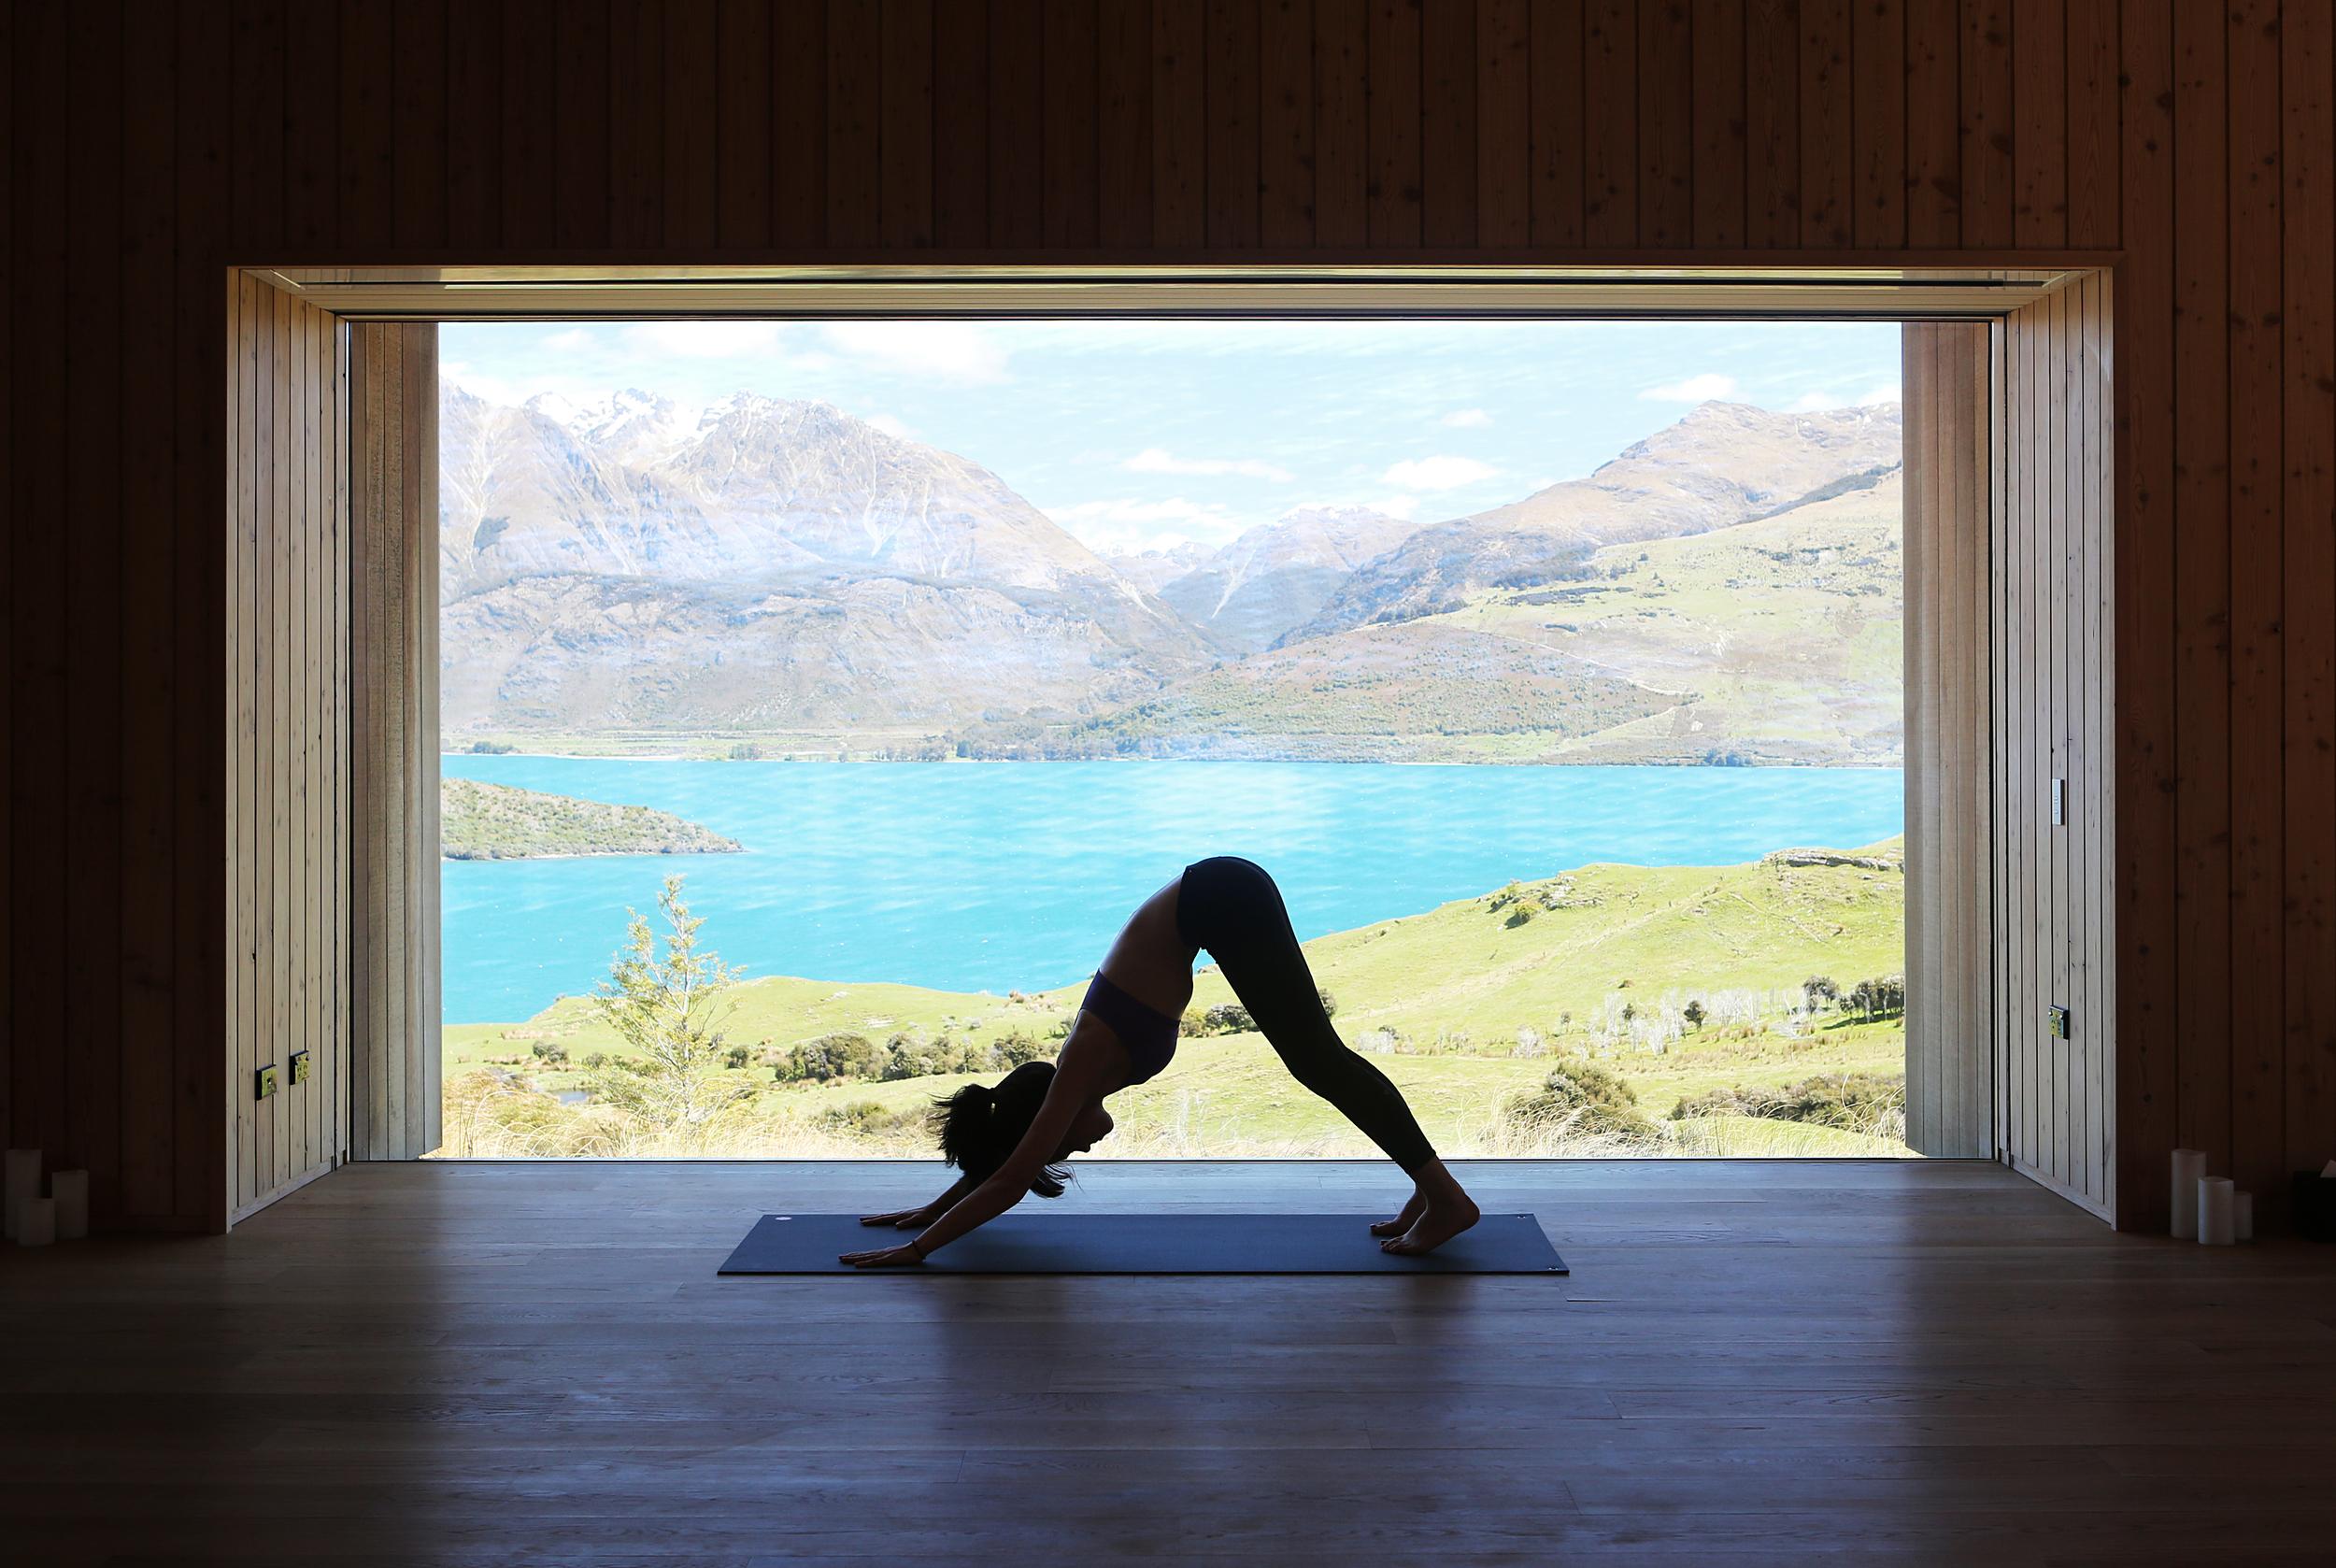 InBedWith_RhiannonTaylor_AroHa_review_newzealand15